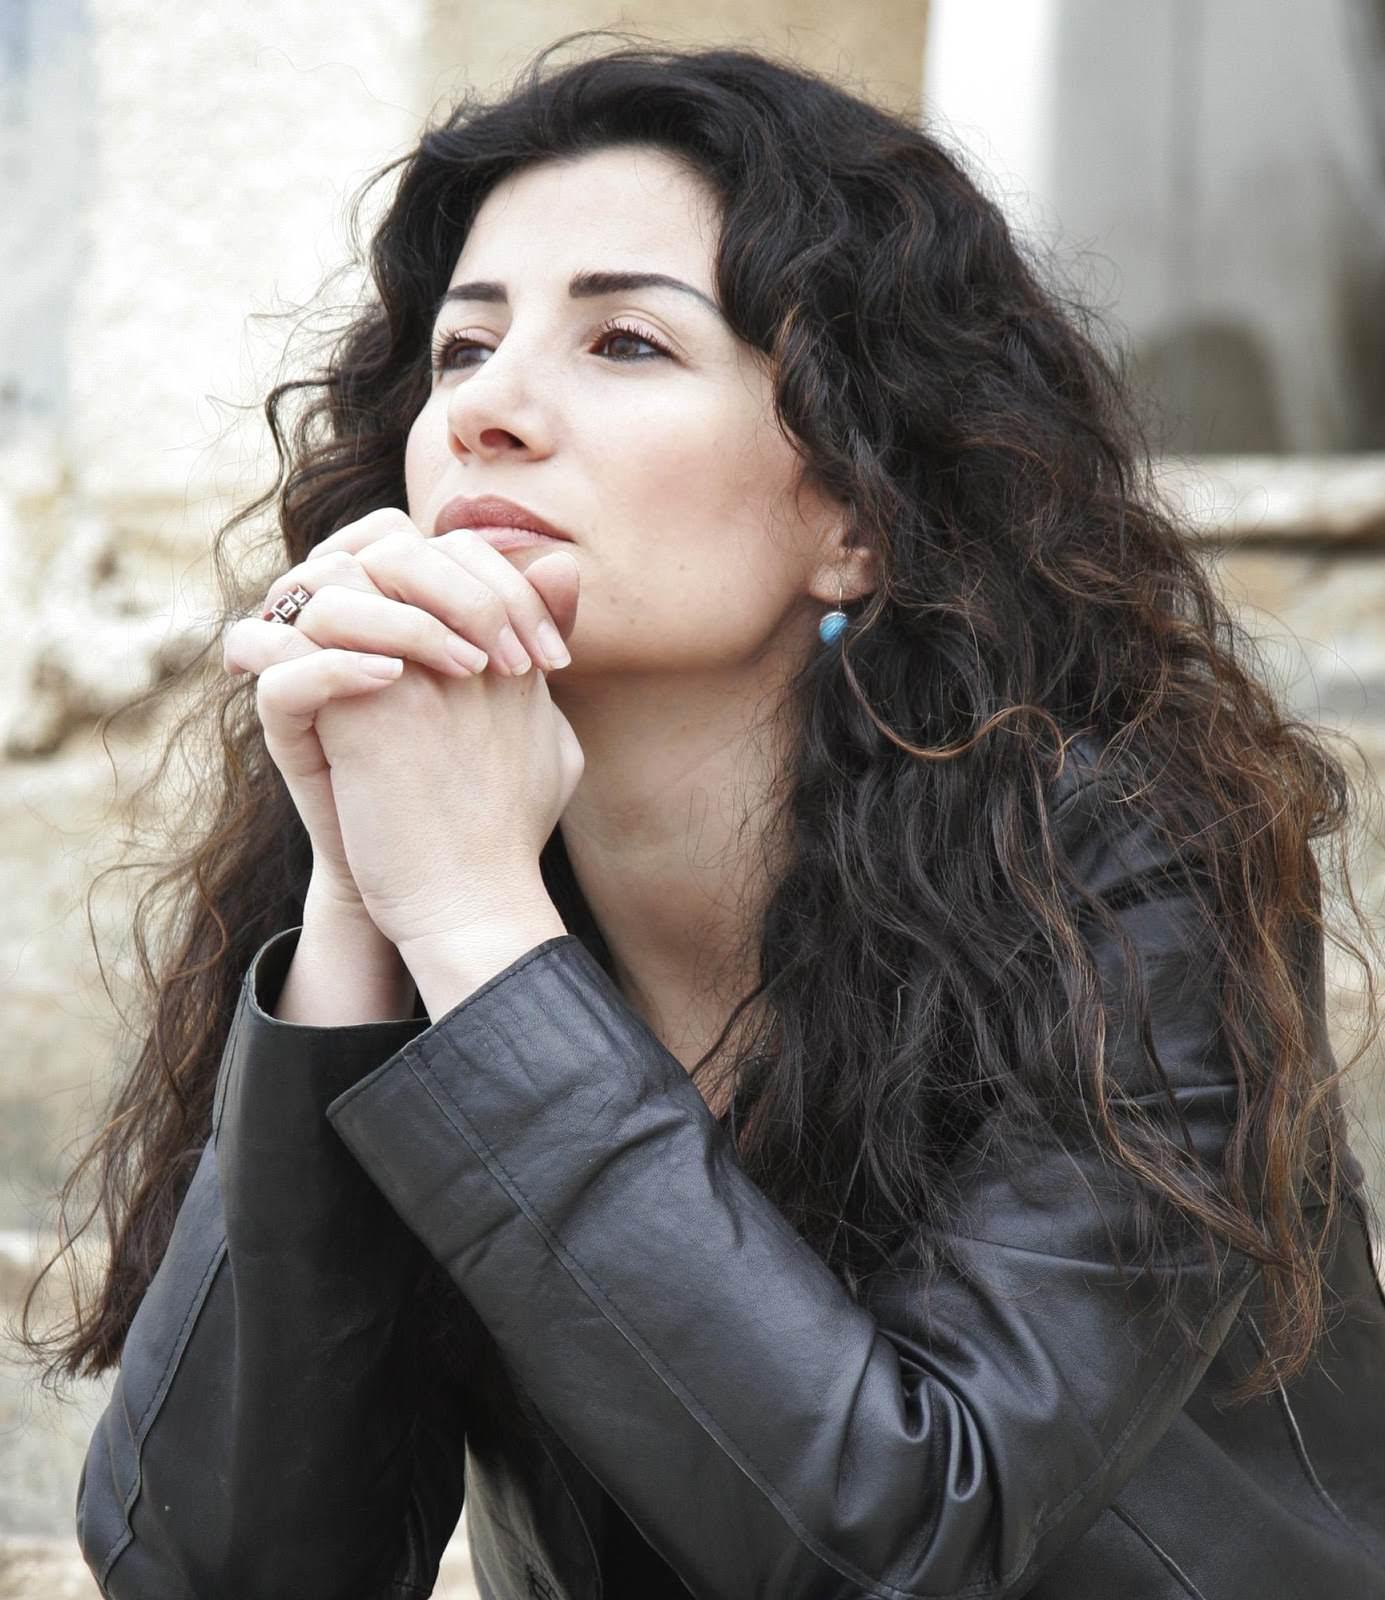 Unas palabras: Joumana Haddad